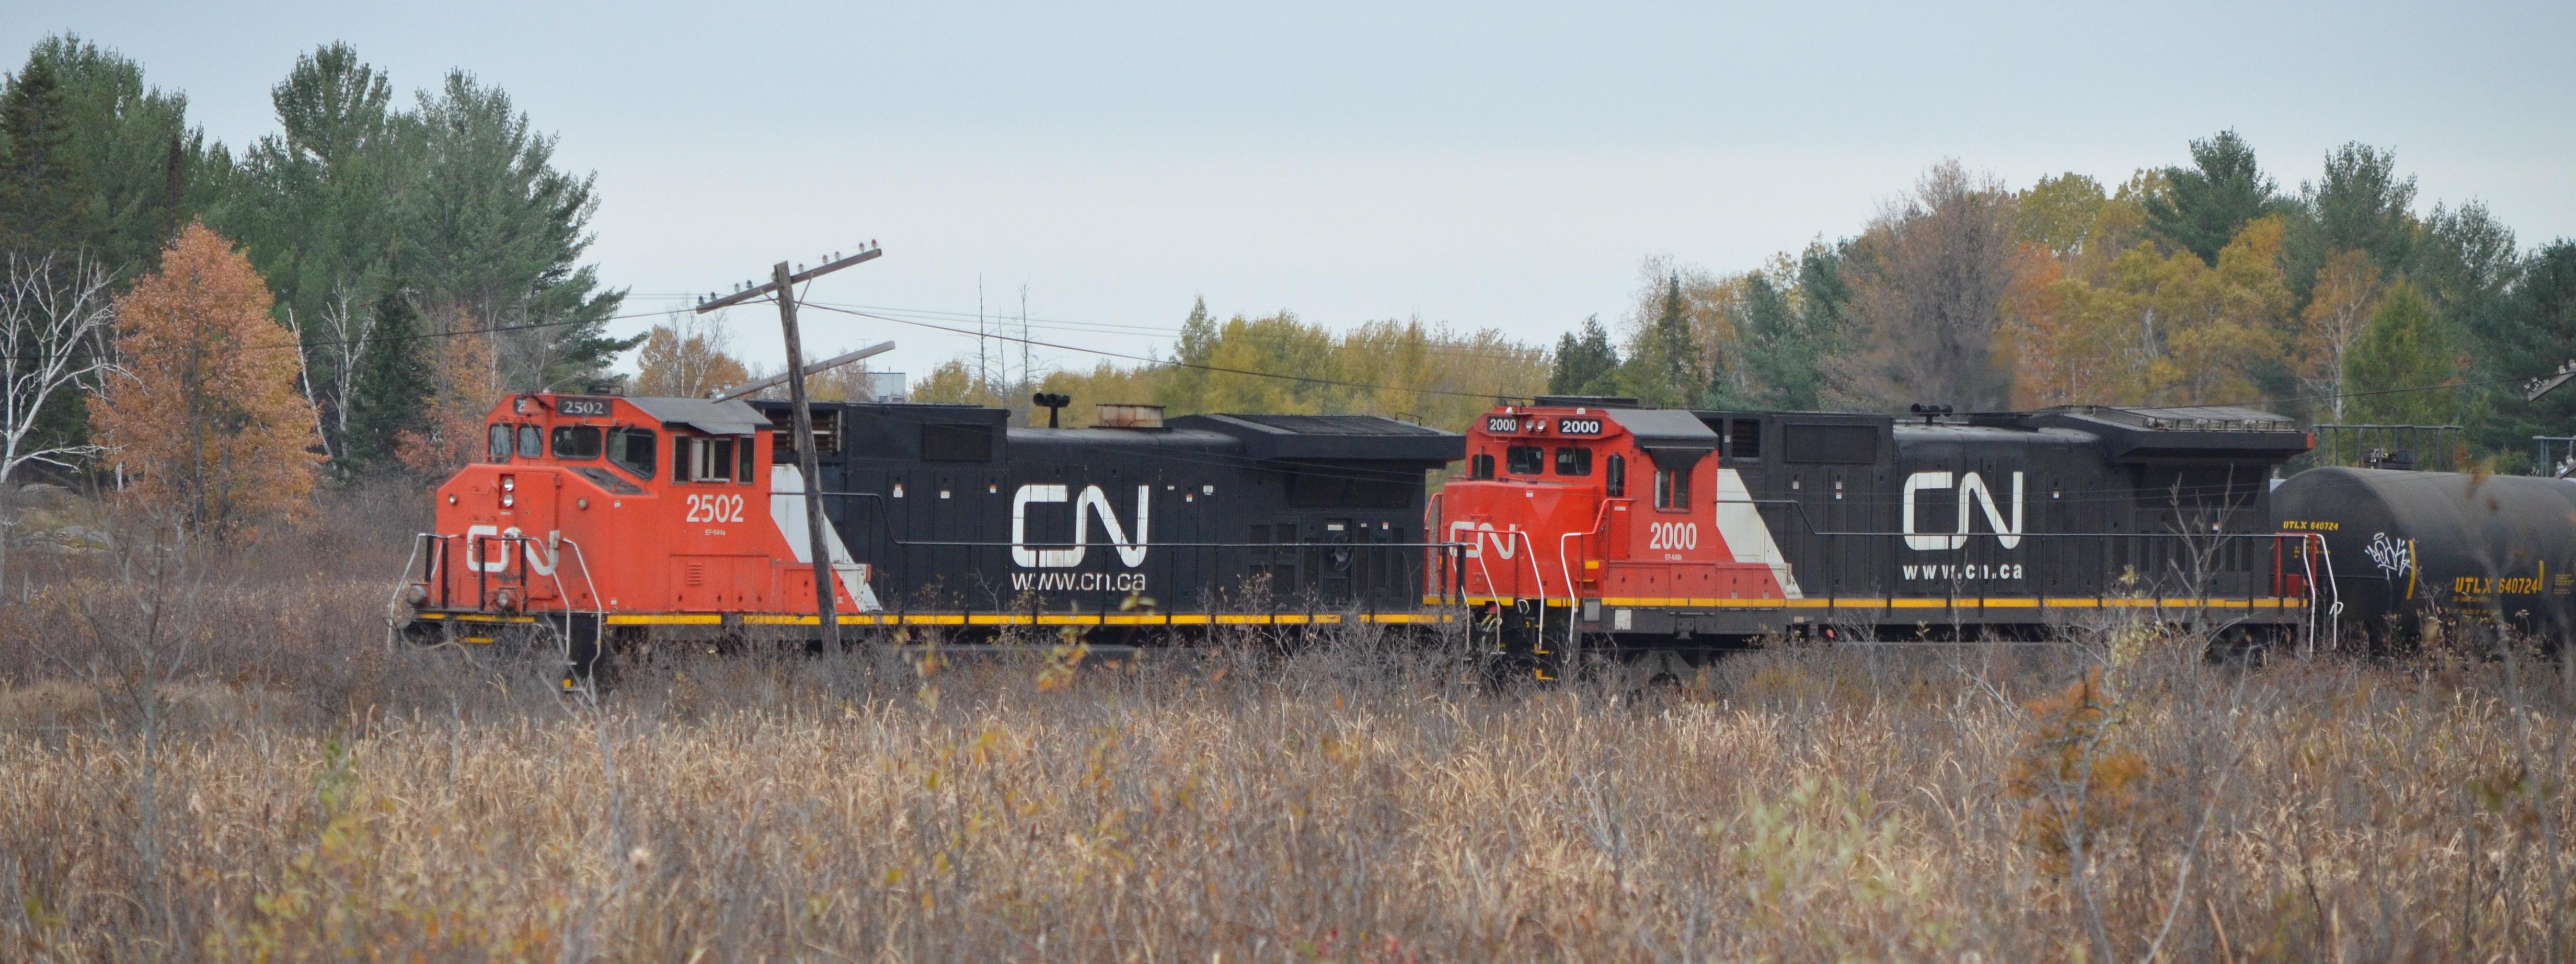 cnr-north-bay-37.jpg